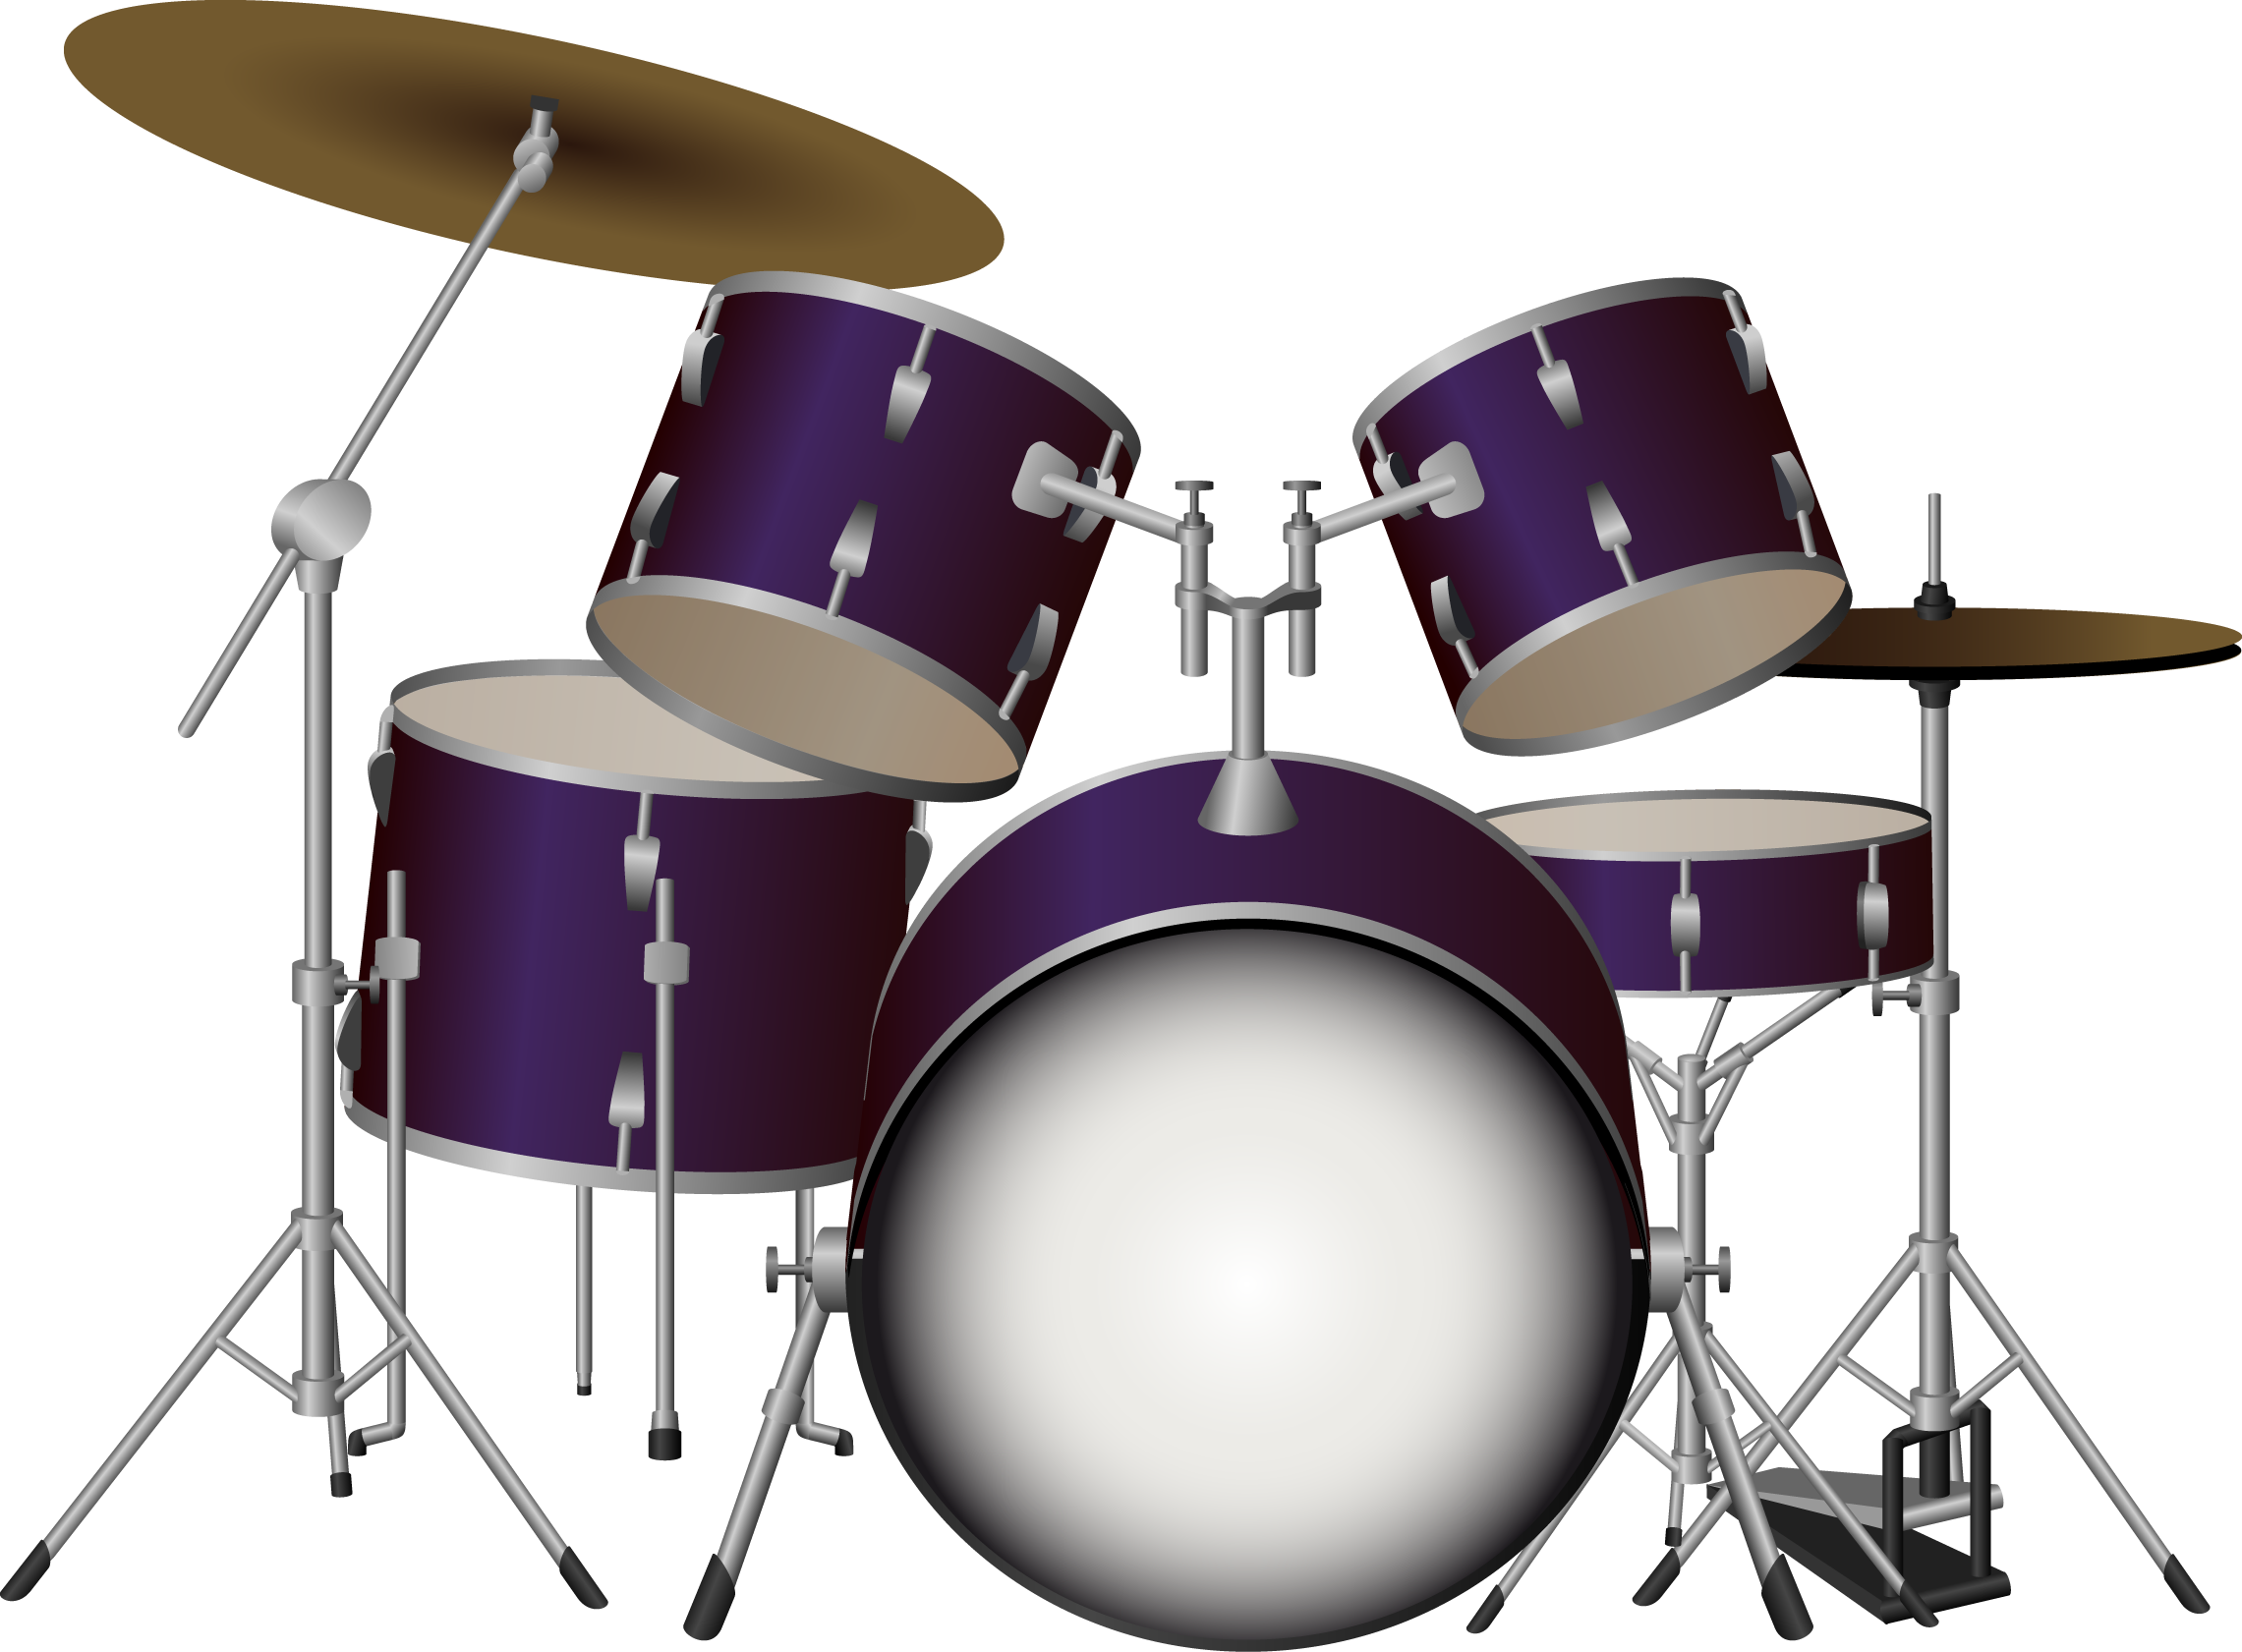 Drums Kit Png Image Drum Kits Drums Instruments